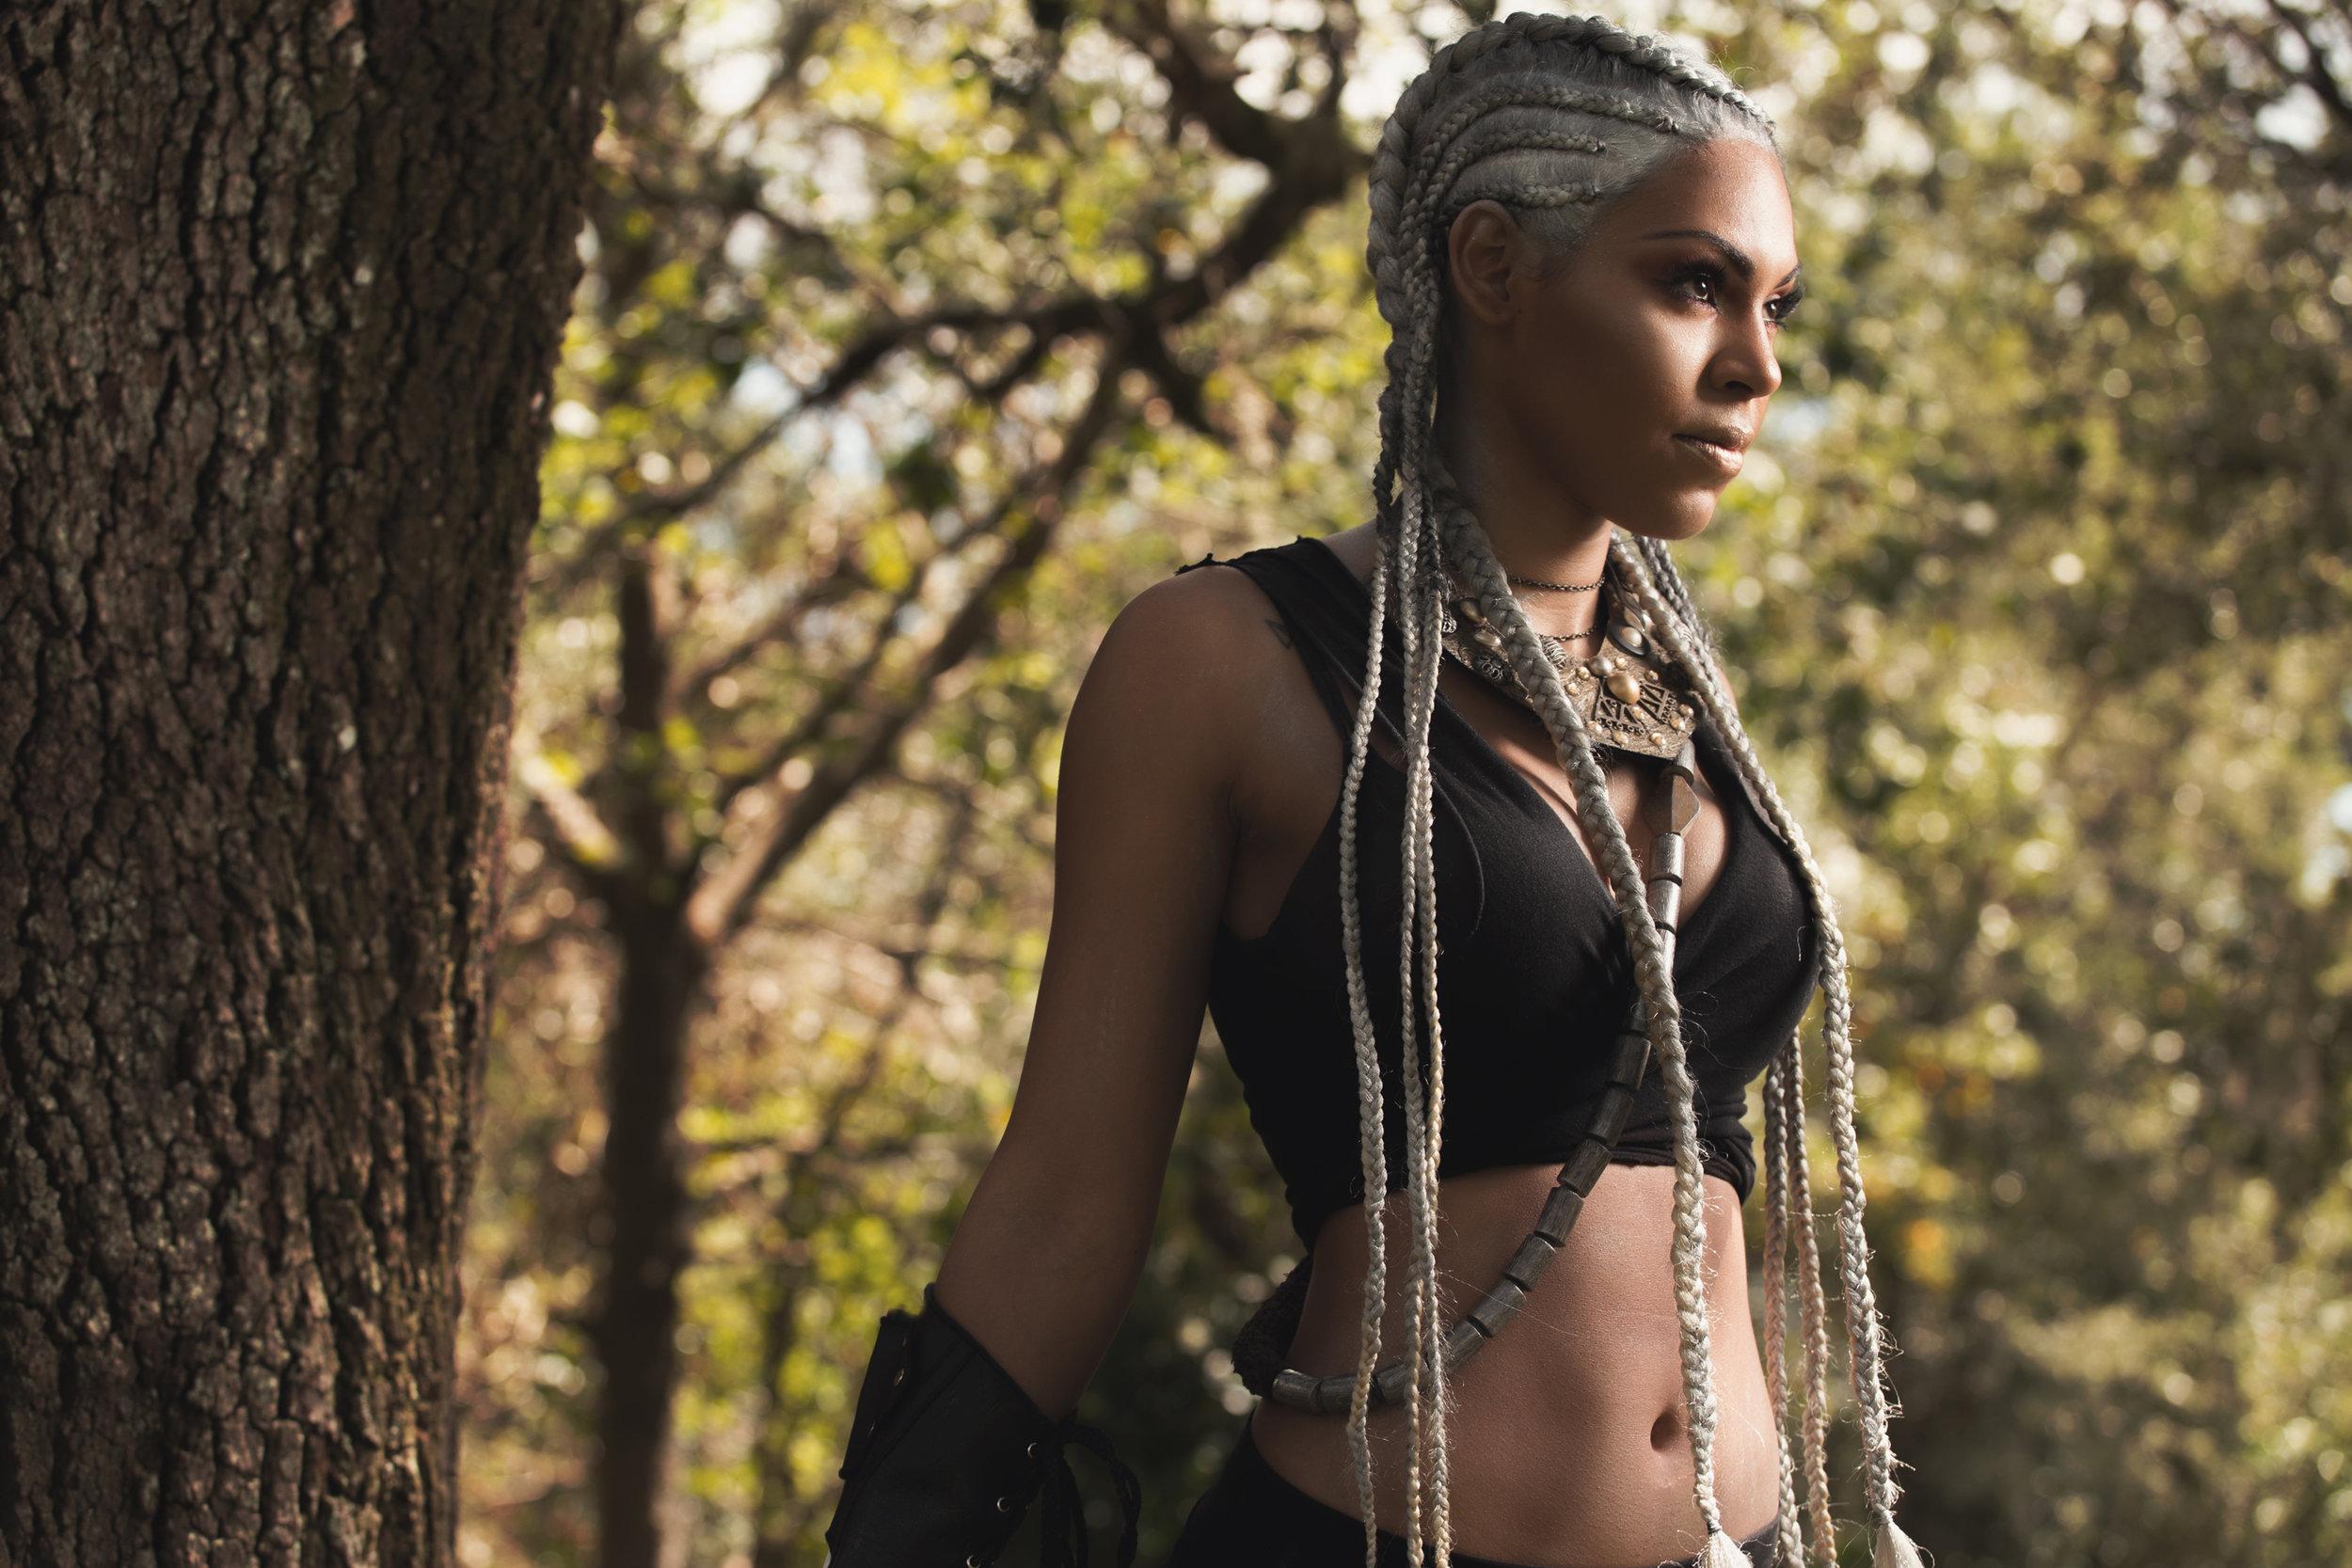 character-chamber-photography-warrior-female7.jpg